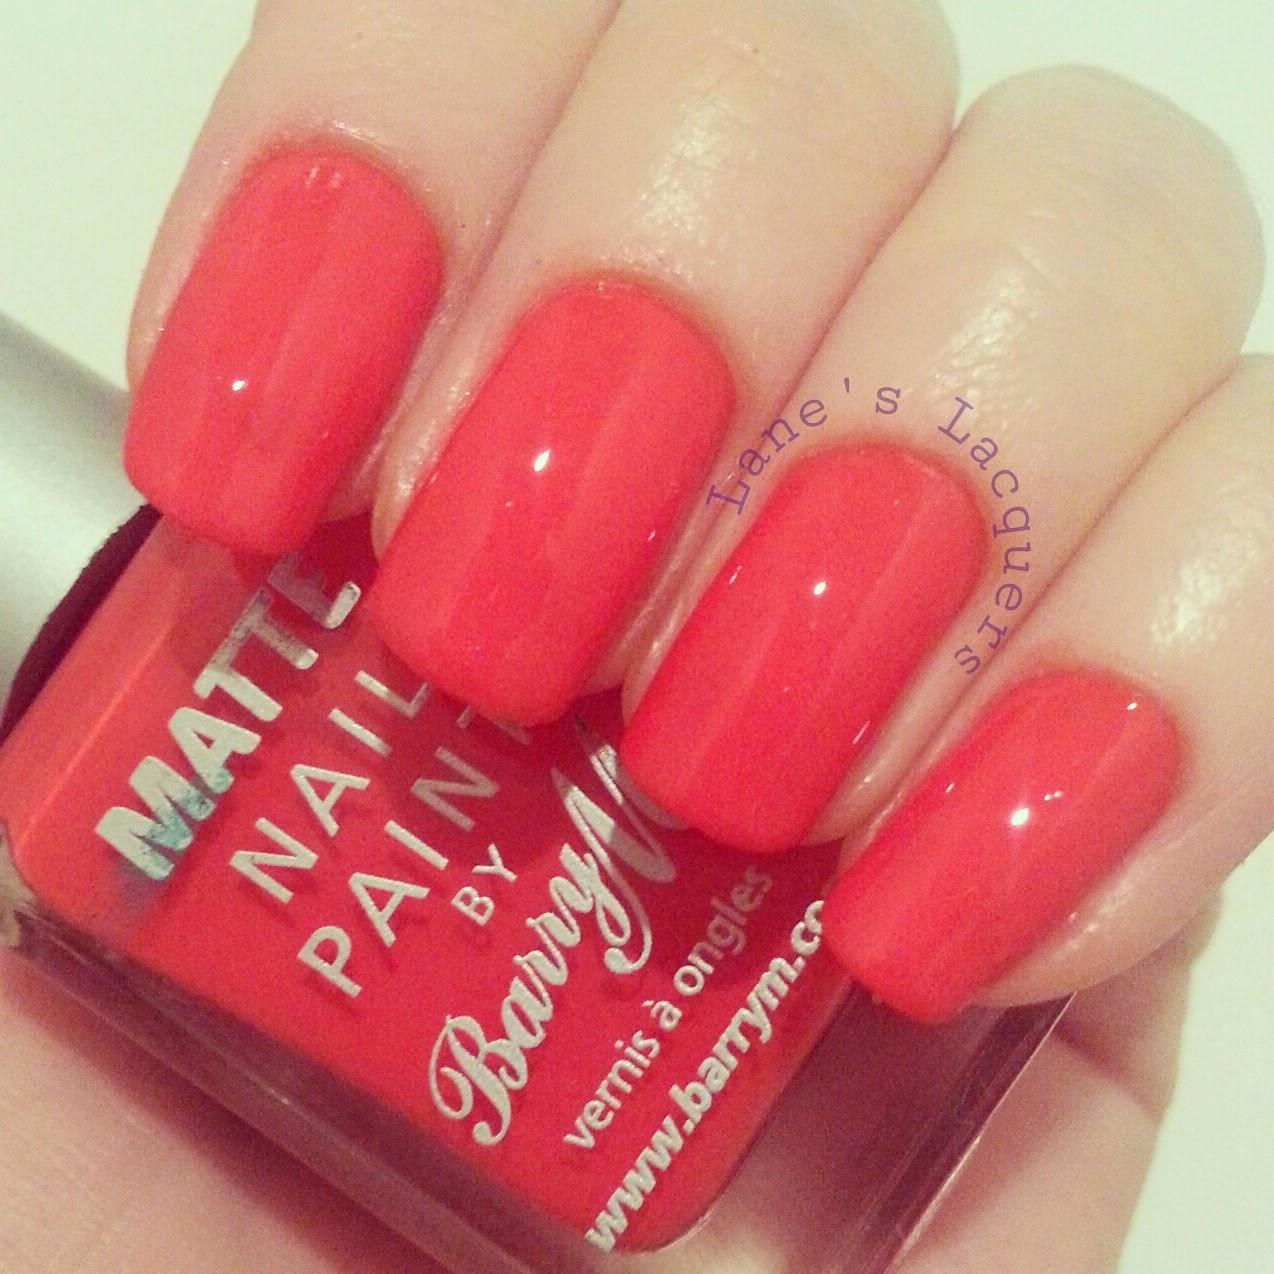 barry-m-copacabana-swatch-manicure (3)